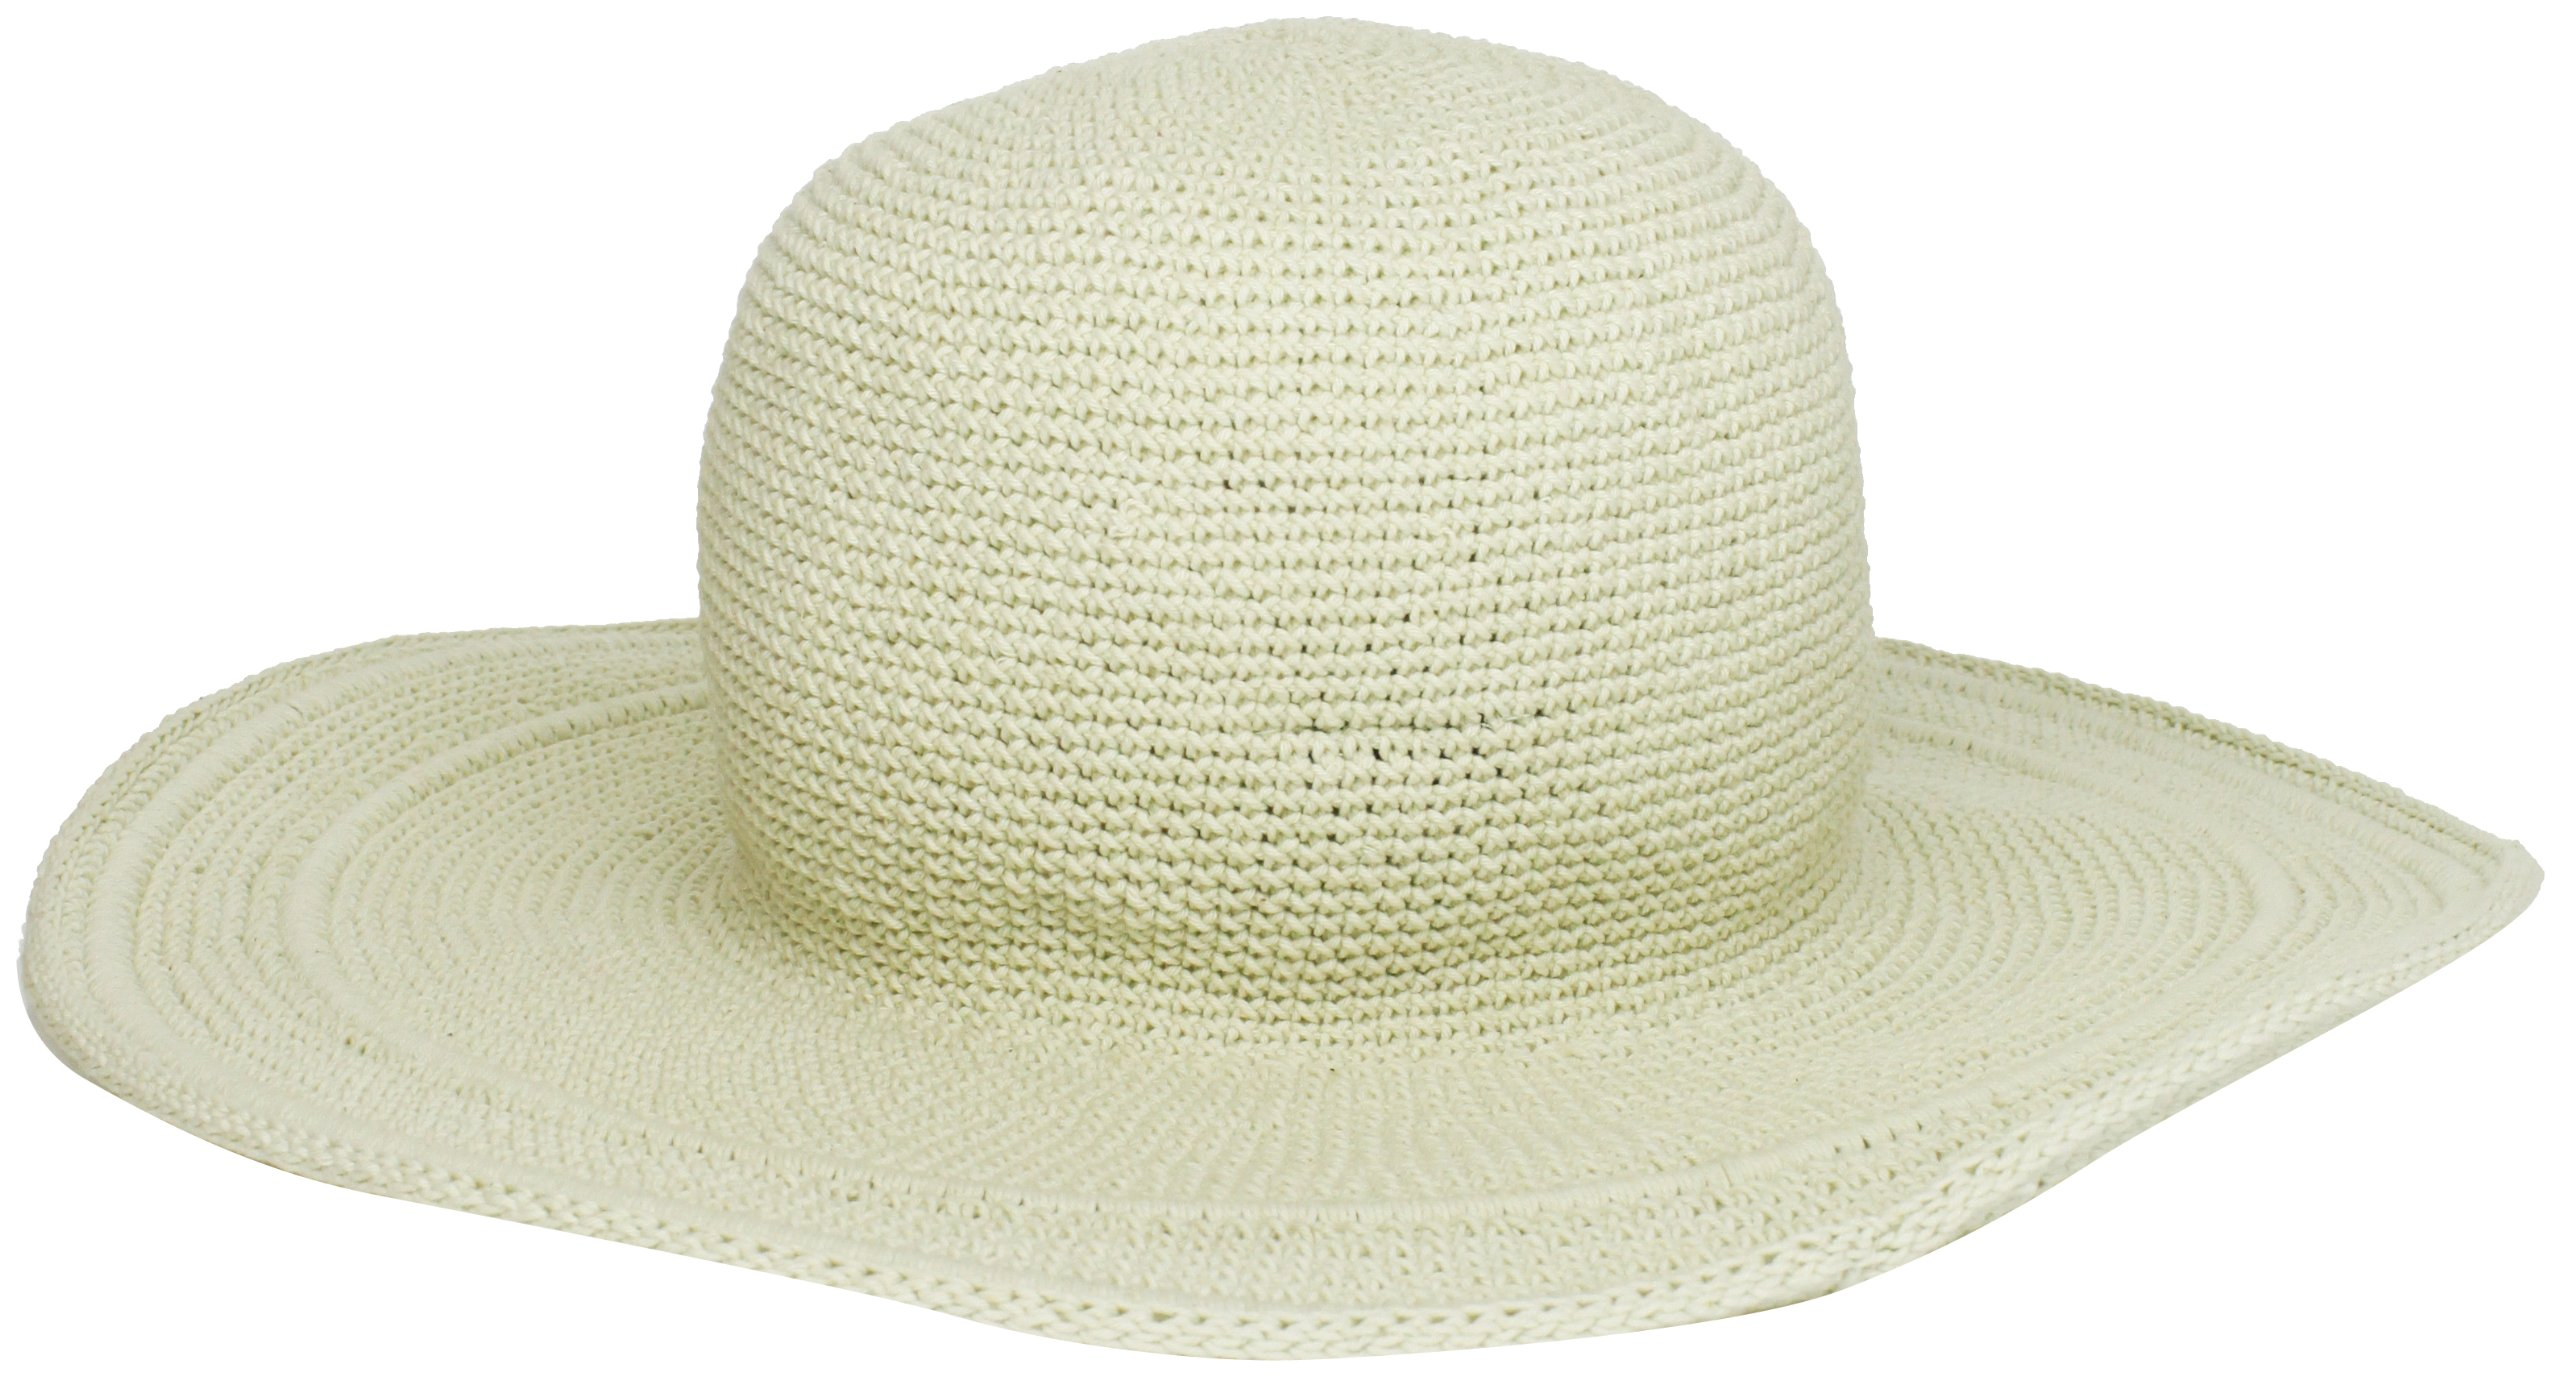 CDM product San Diego Hat Company Women's Cotton Crochet 4 Inch Brim Floppy Hat big image